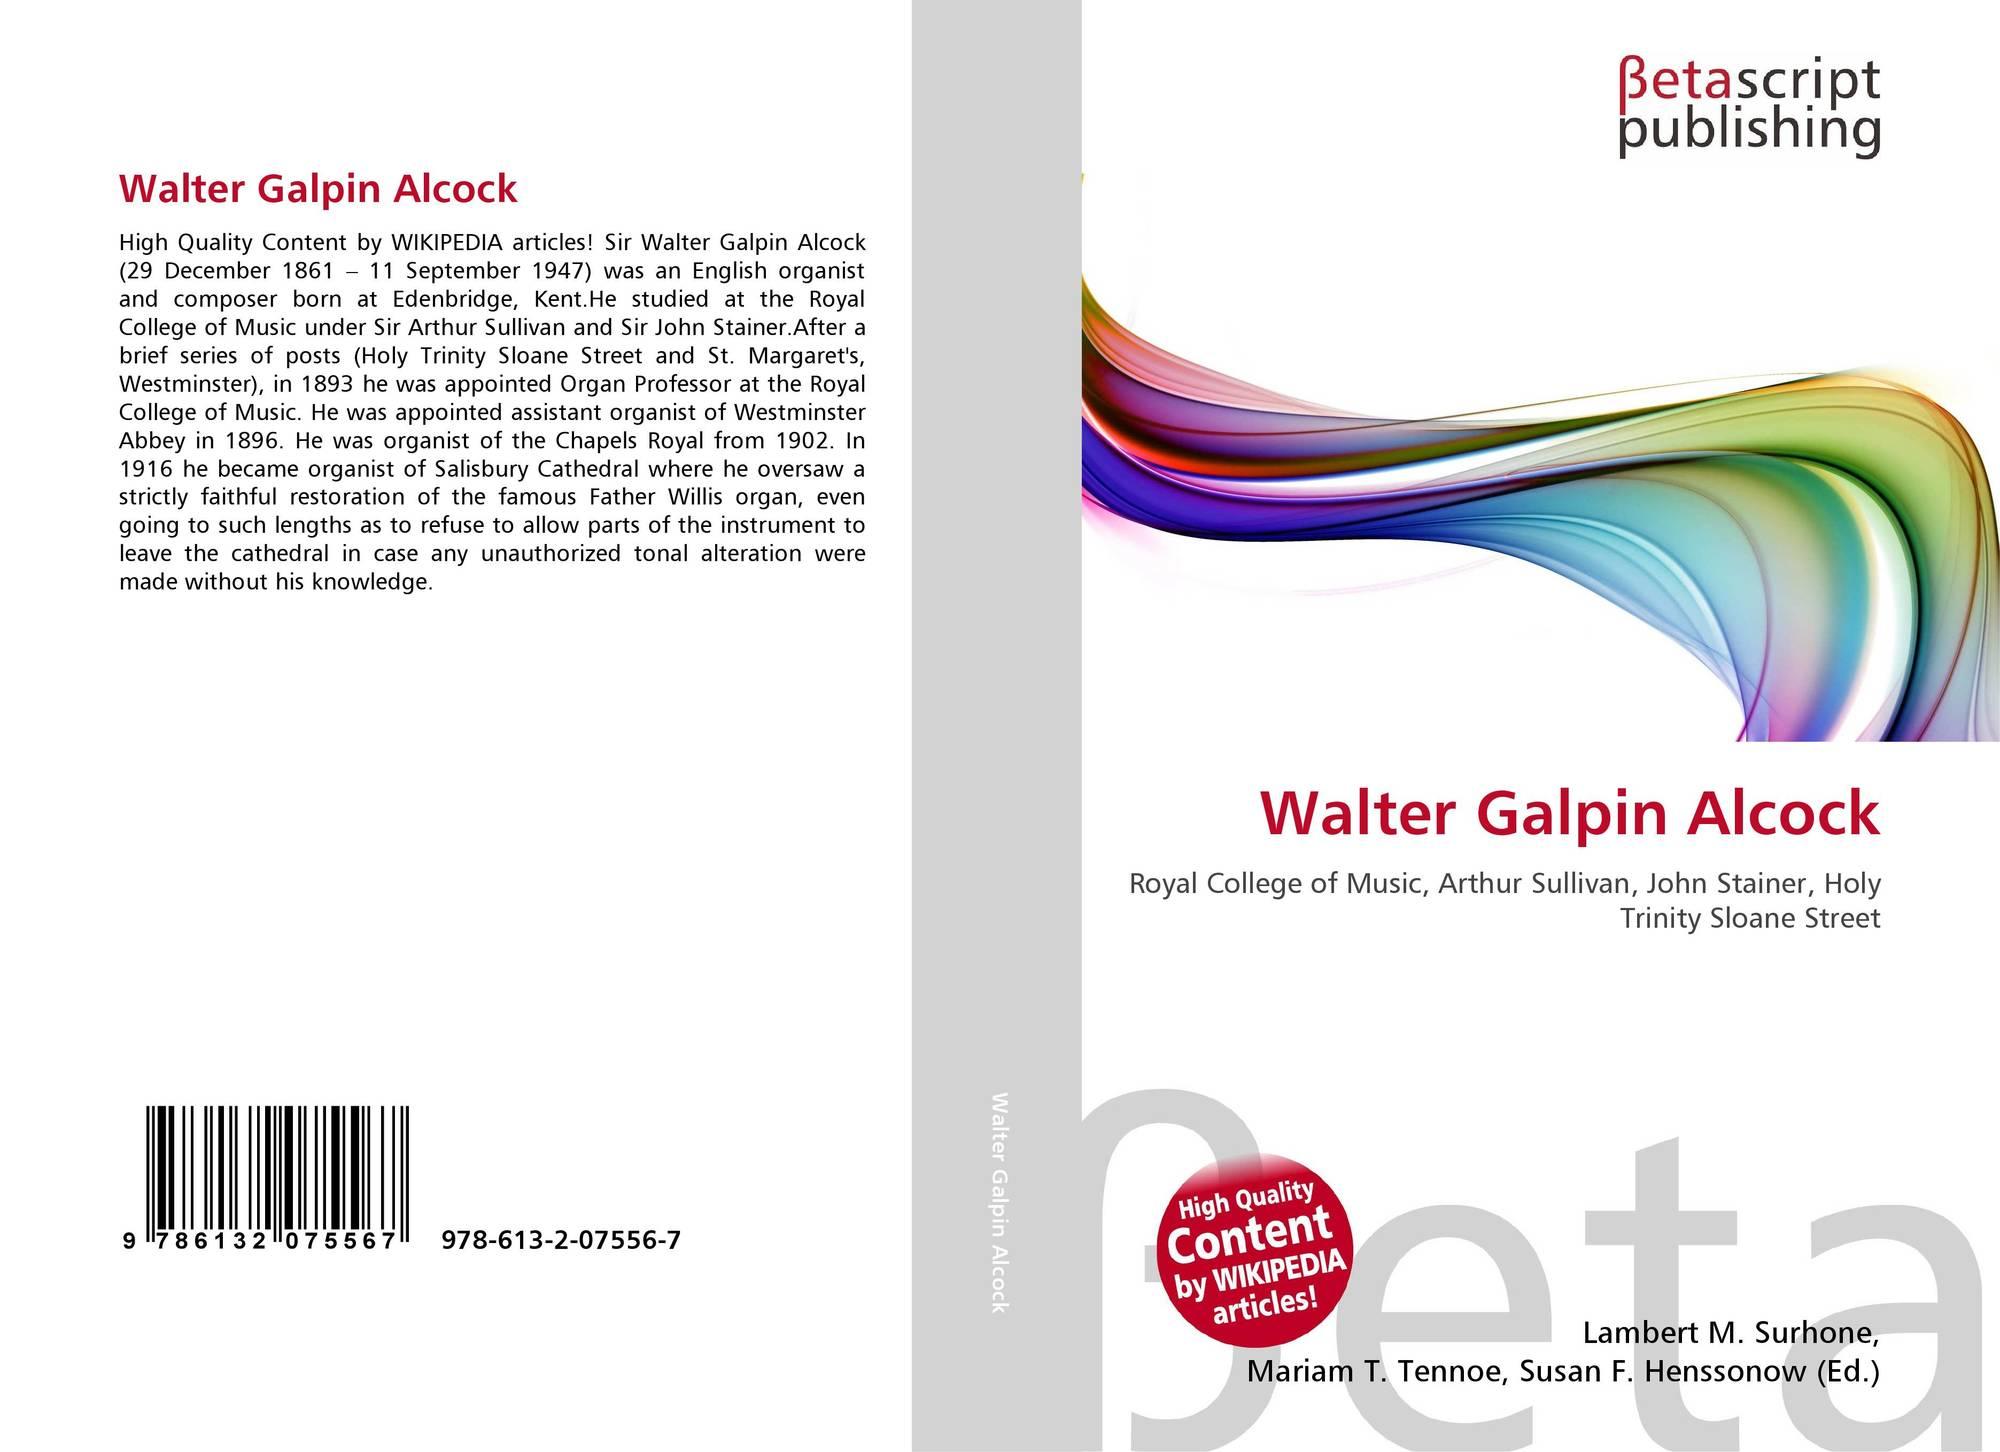 Walter Galpin Alcock